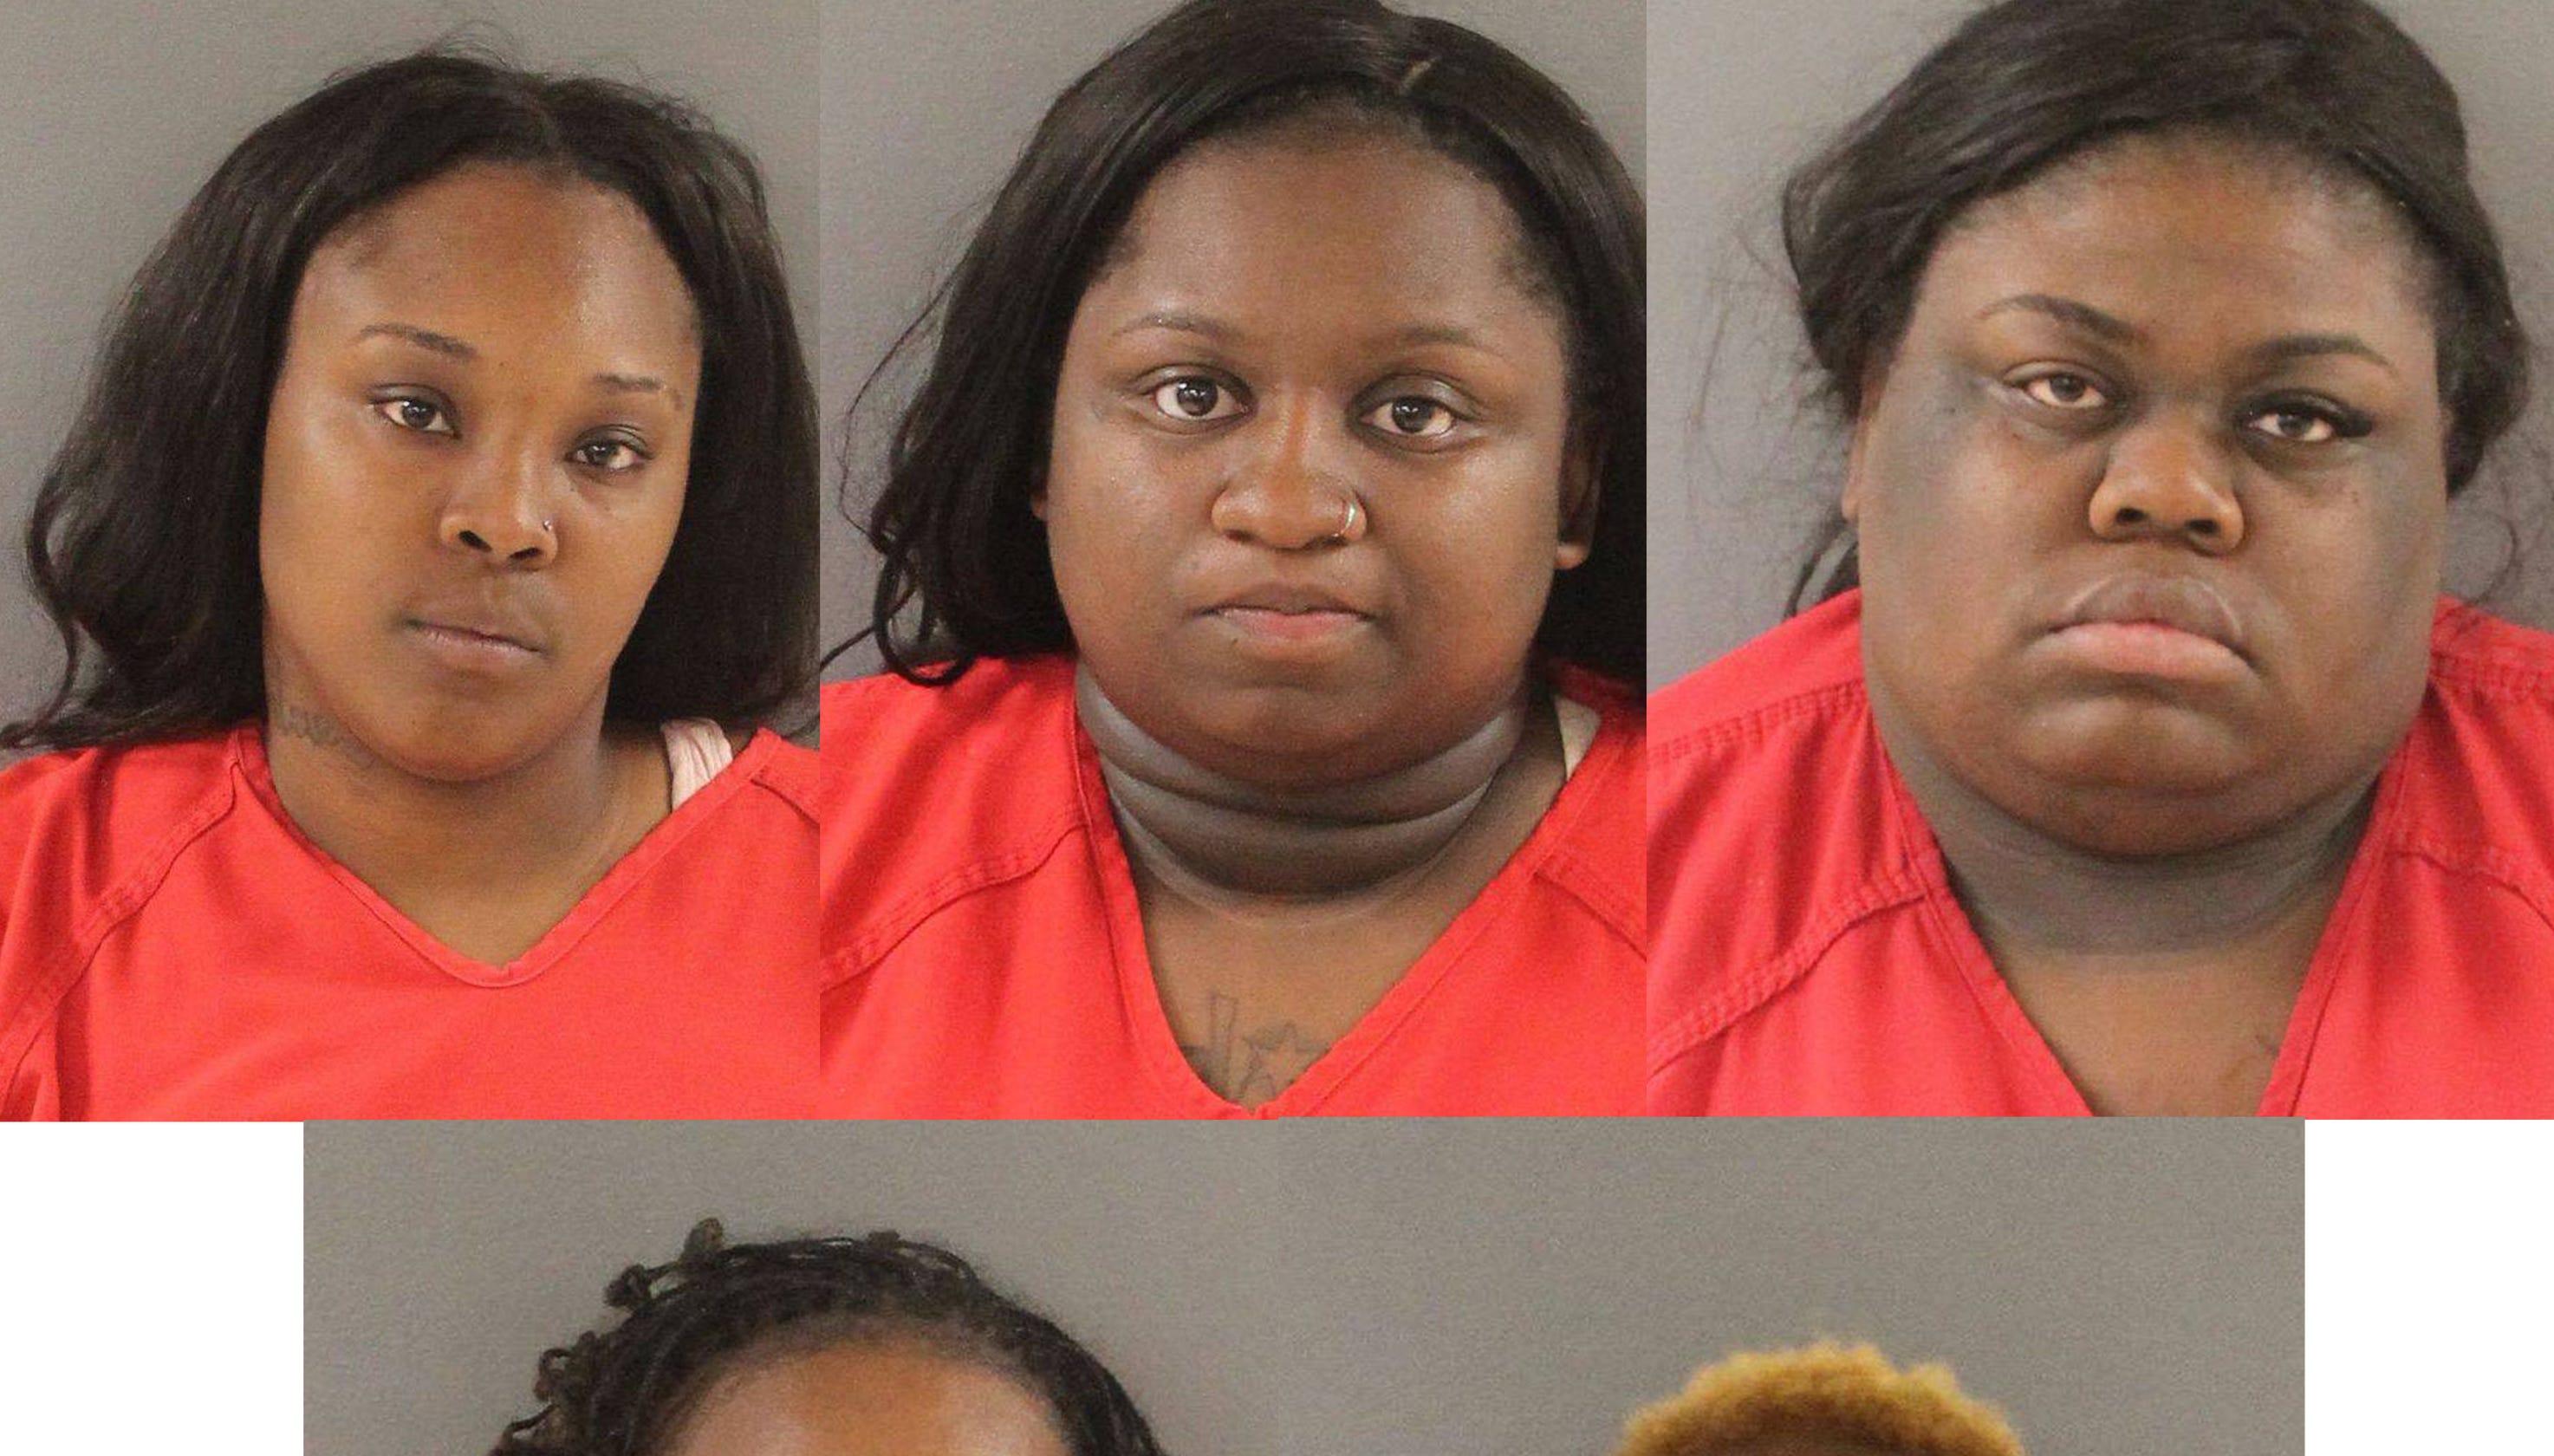 KPD: 5 arrested in shoplifting scheme at Walmart